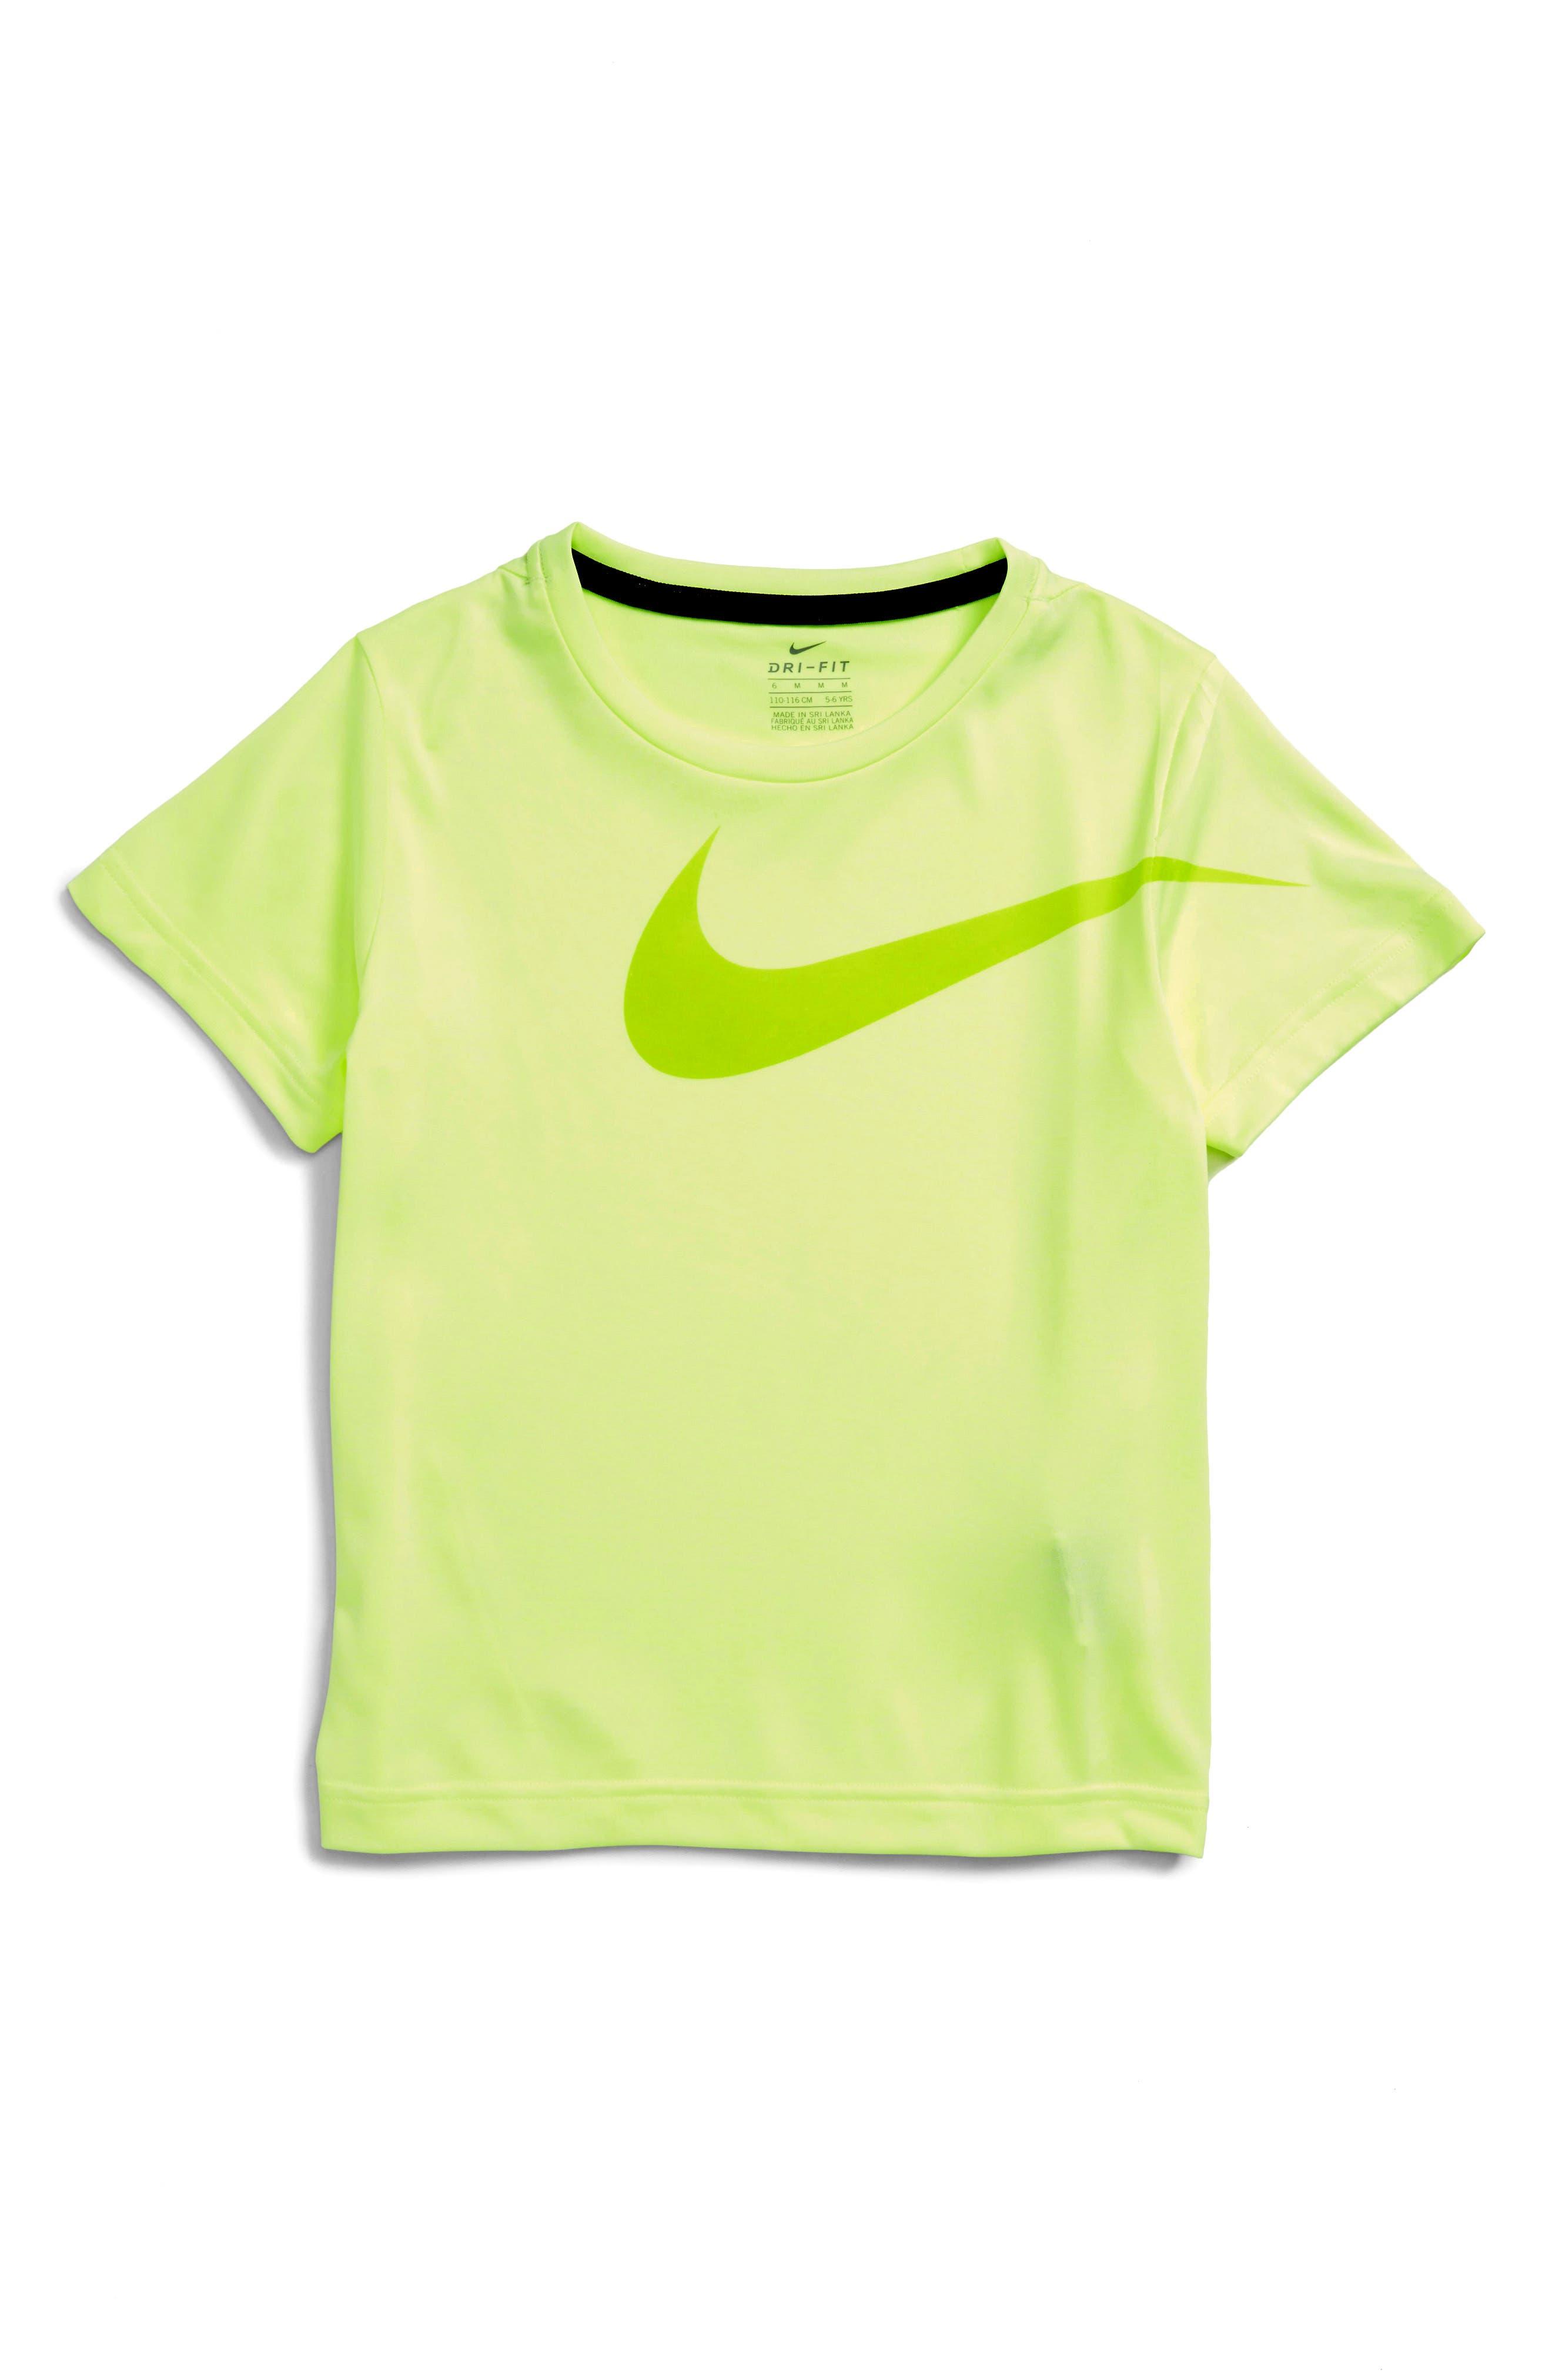 Nike Dri-FIT T-Shirt (Toddler Boys & Little Boys)